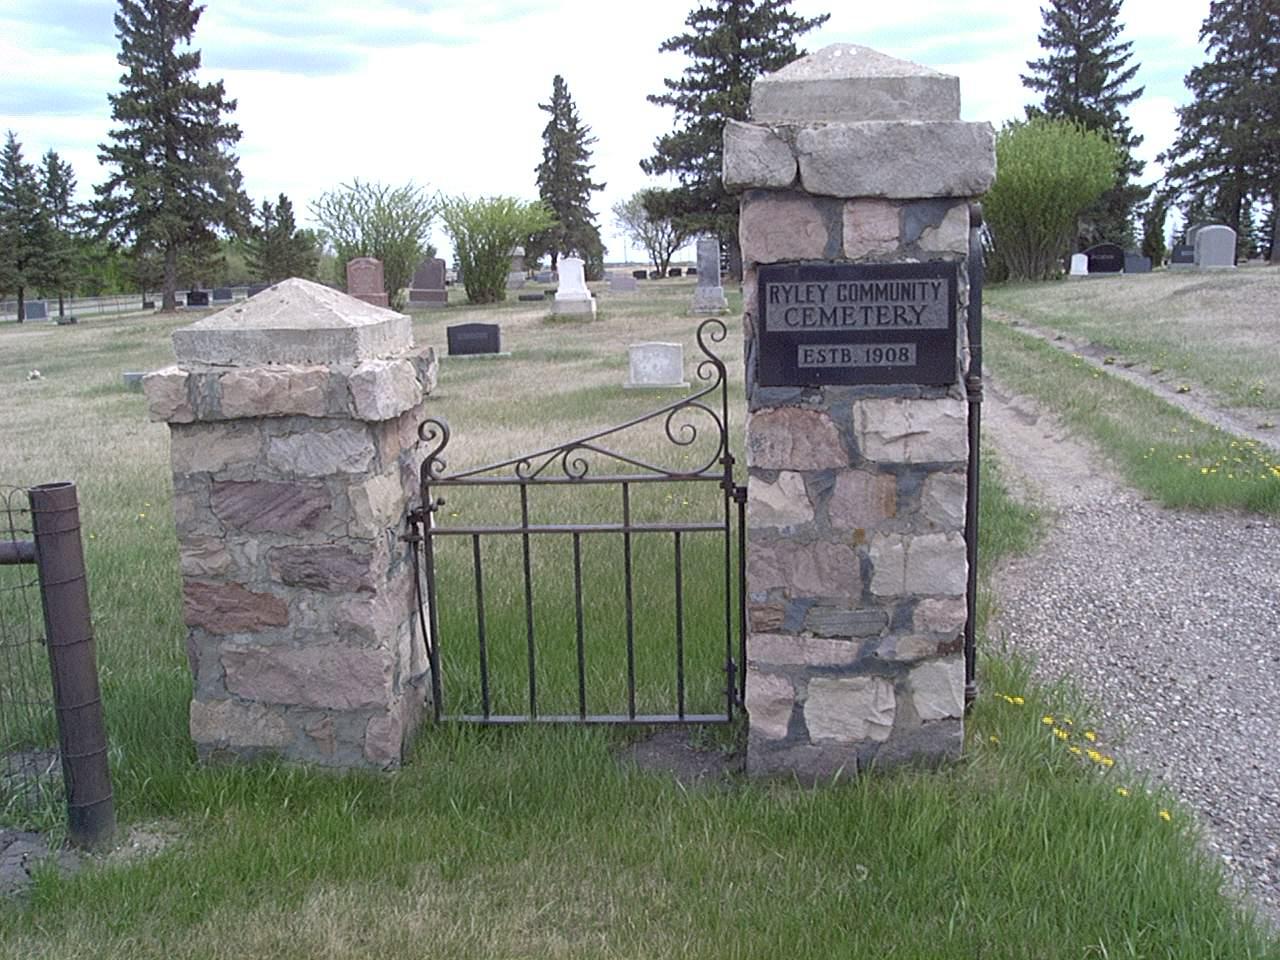 Ryley Community Cemetery